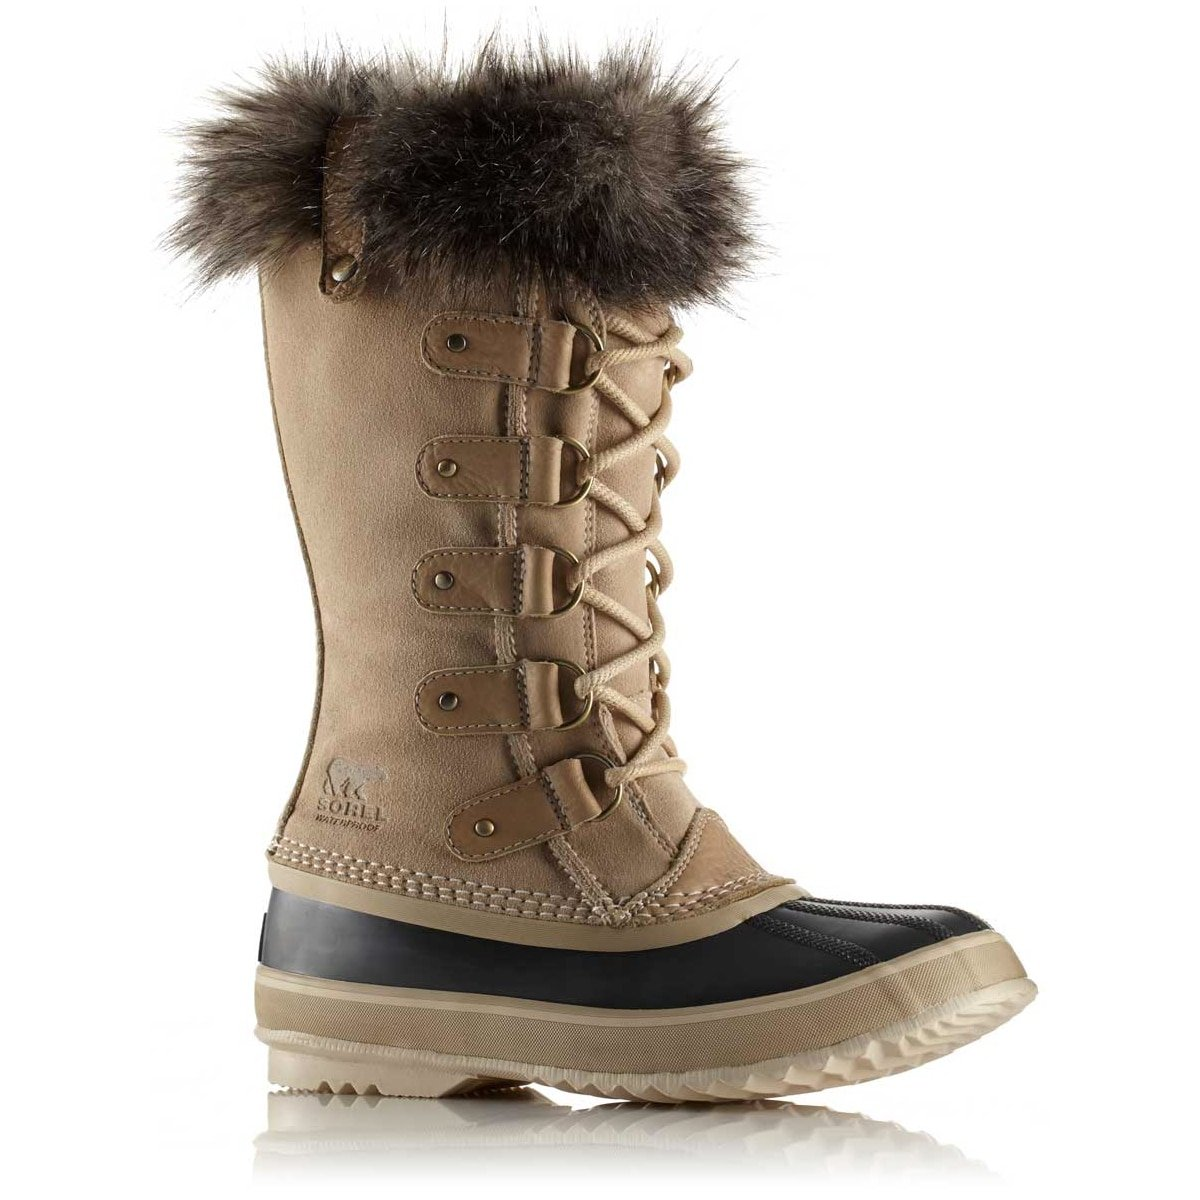 SOREL Women's Joan Of Arctic Boots, Oatmeal, 8 B(M) US